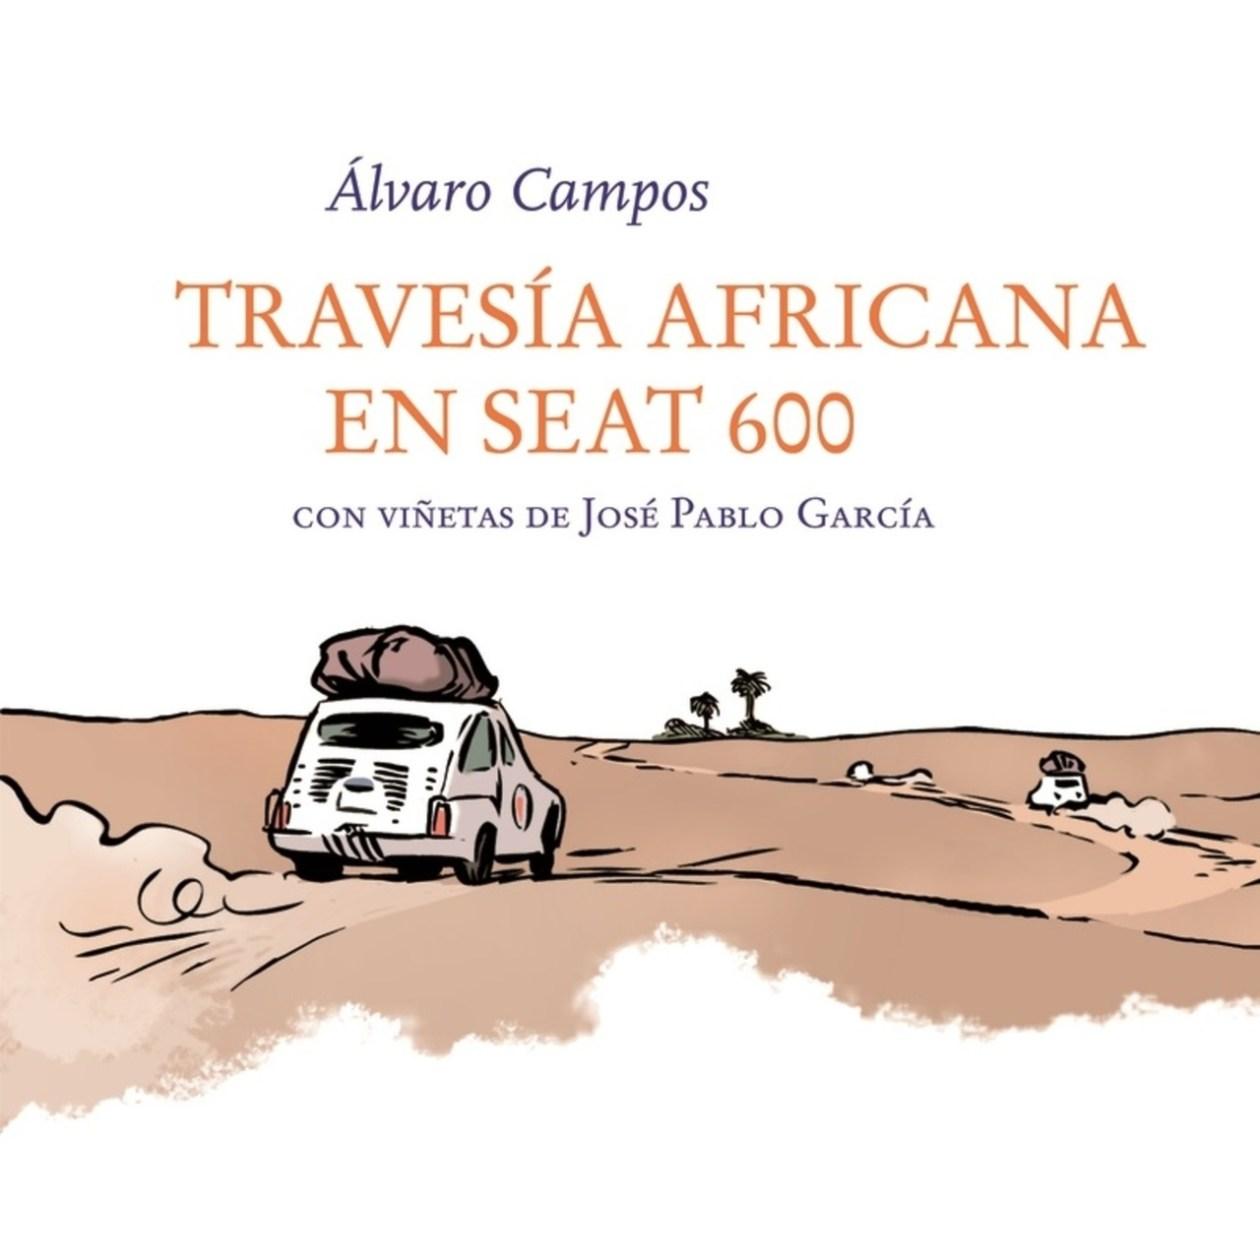 Travesia Africana Seat 600